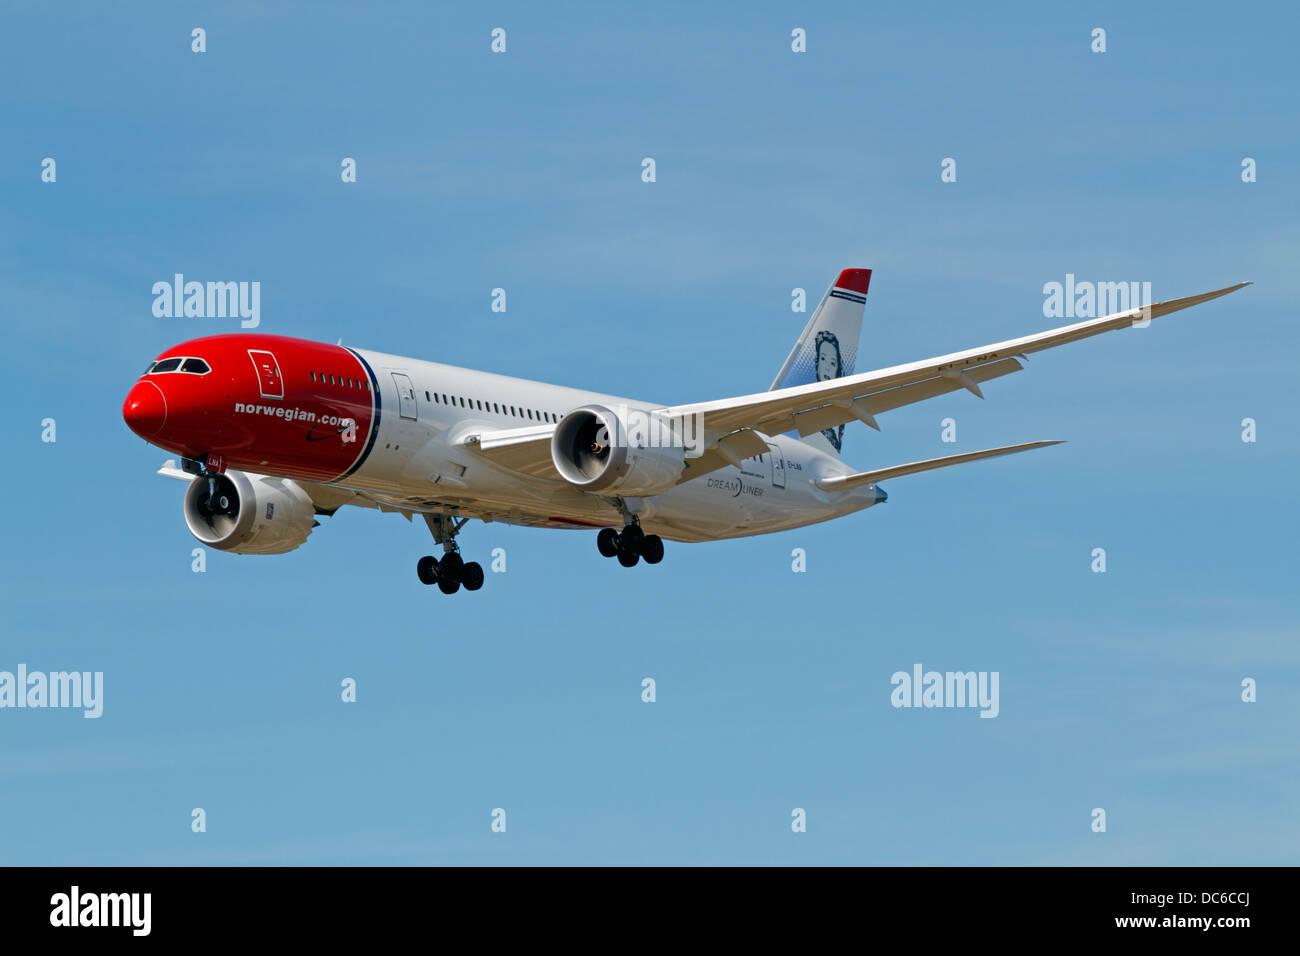 b788-boeing-787-8-dreamliner-ei-lna-norw